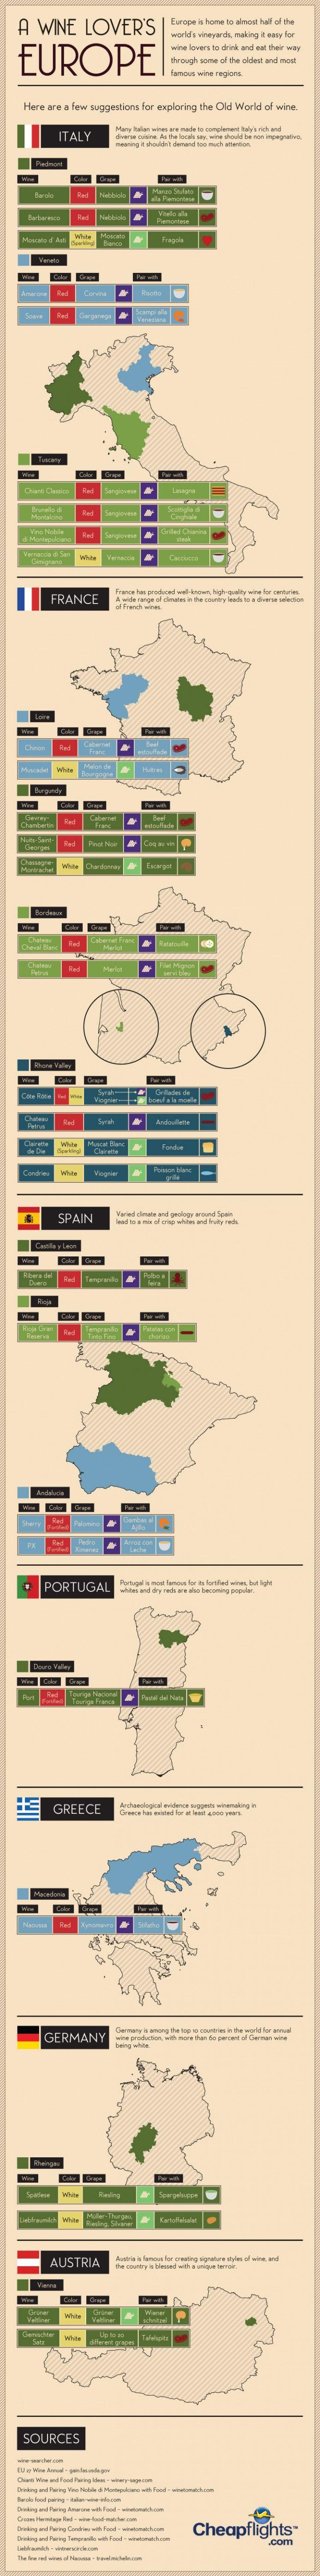 #Infographic:#Wine #www.avacationrental4me.com